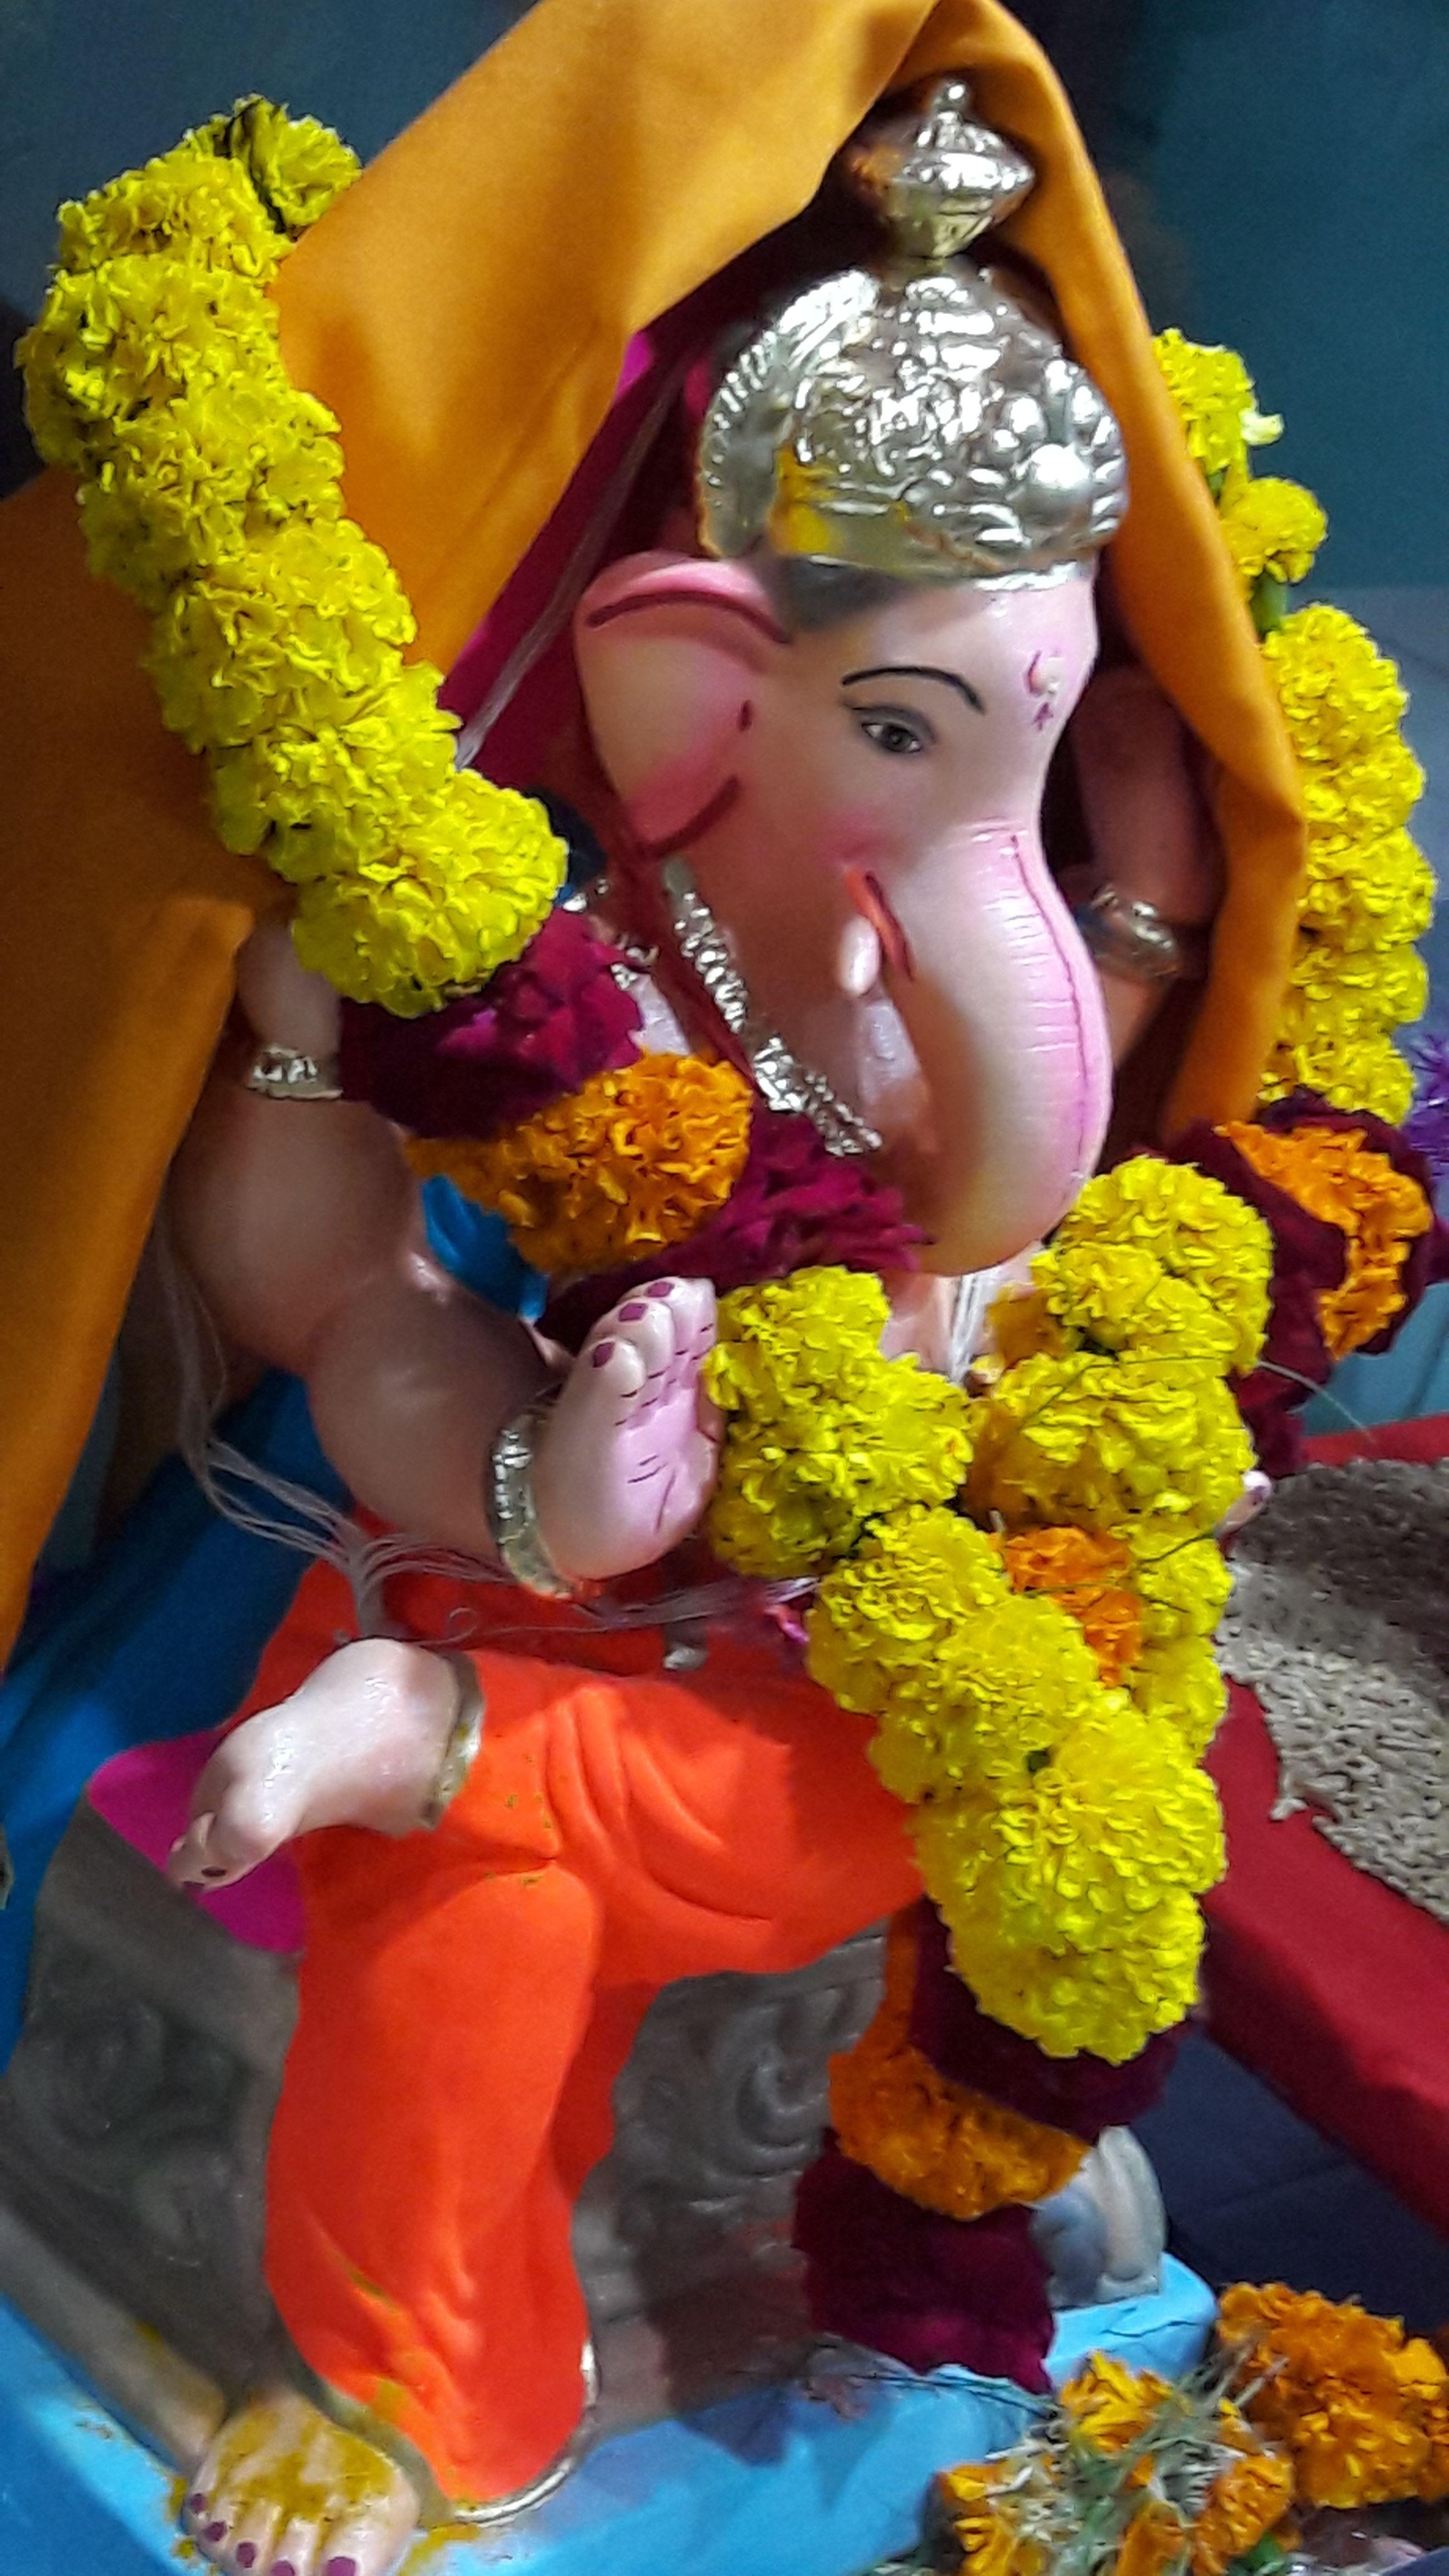 Webmyne Systems celebrates GANESH CHATURTHI May Lord Ganesh protect you and your family and bless you with peace and joy! Happy Ganesh Chaturthi! #GaneshChaturthi #ganpatibappamorya